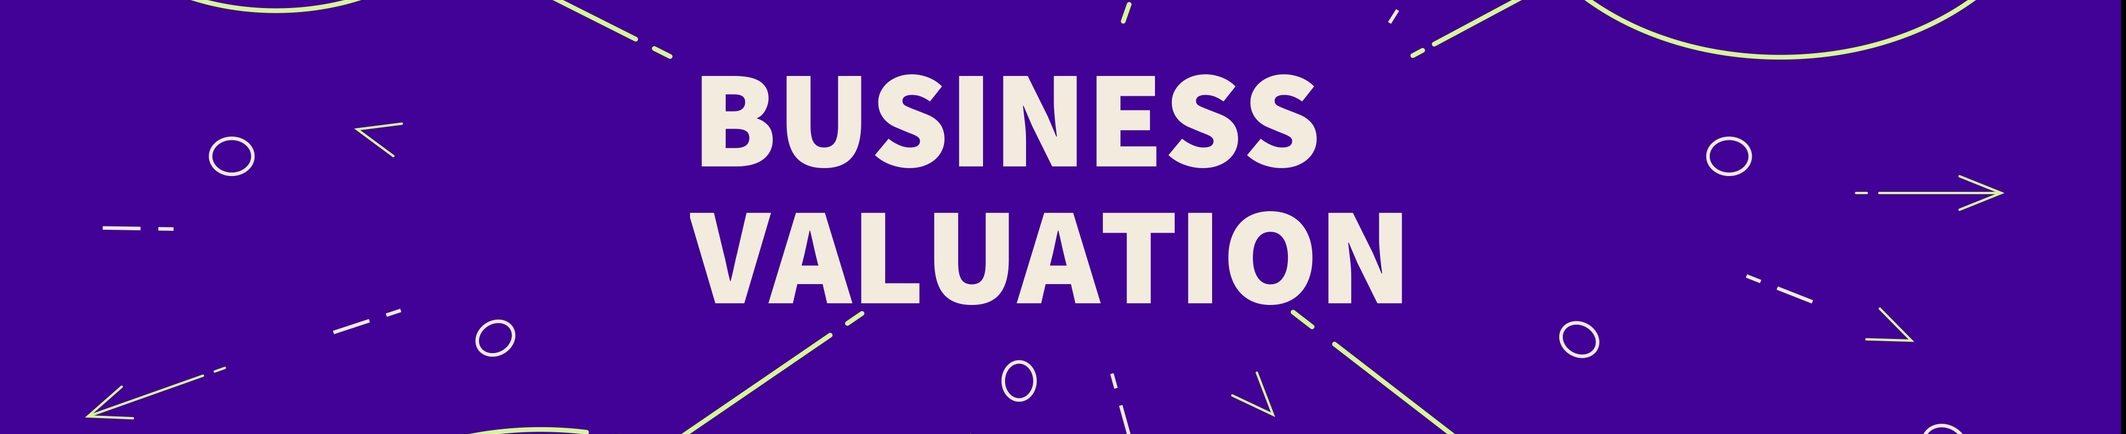 business valuation techniques training